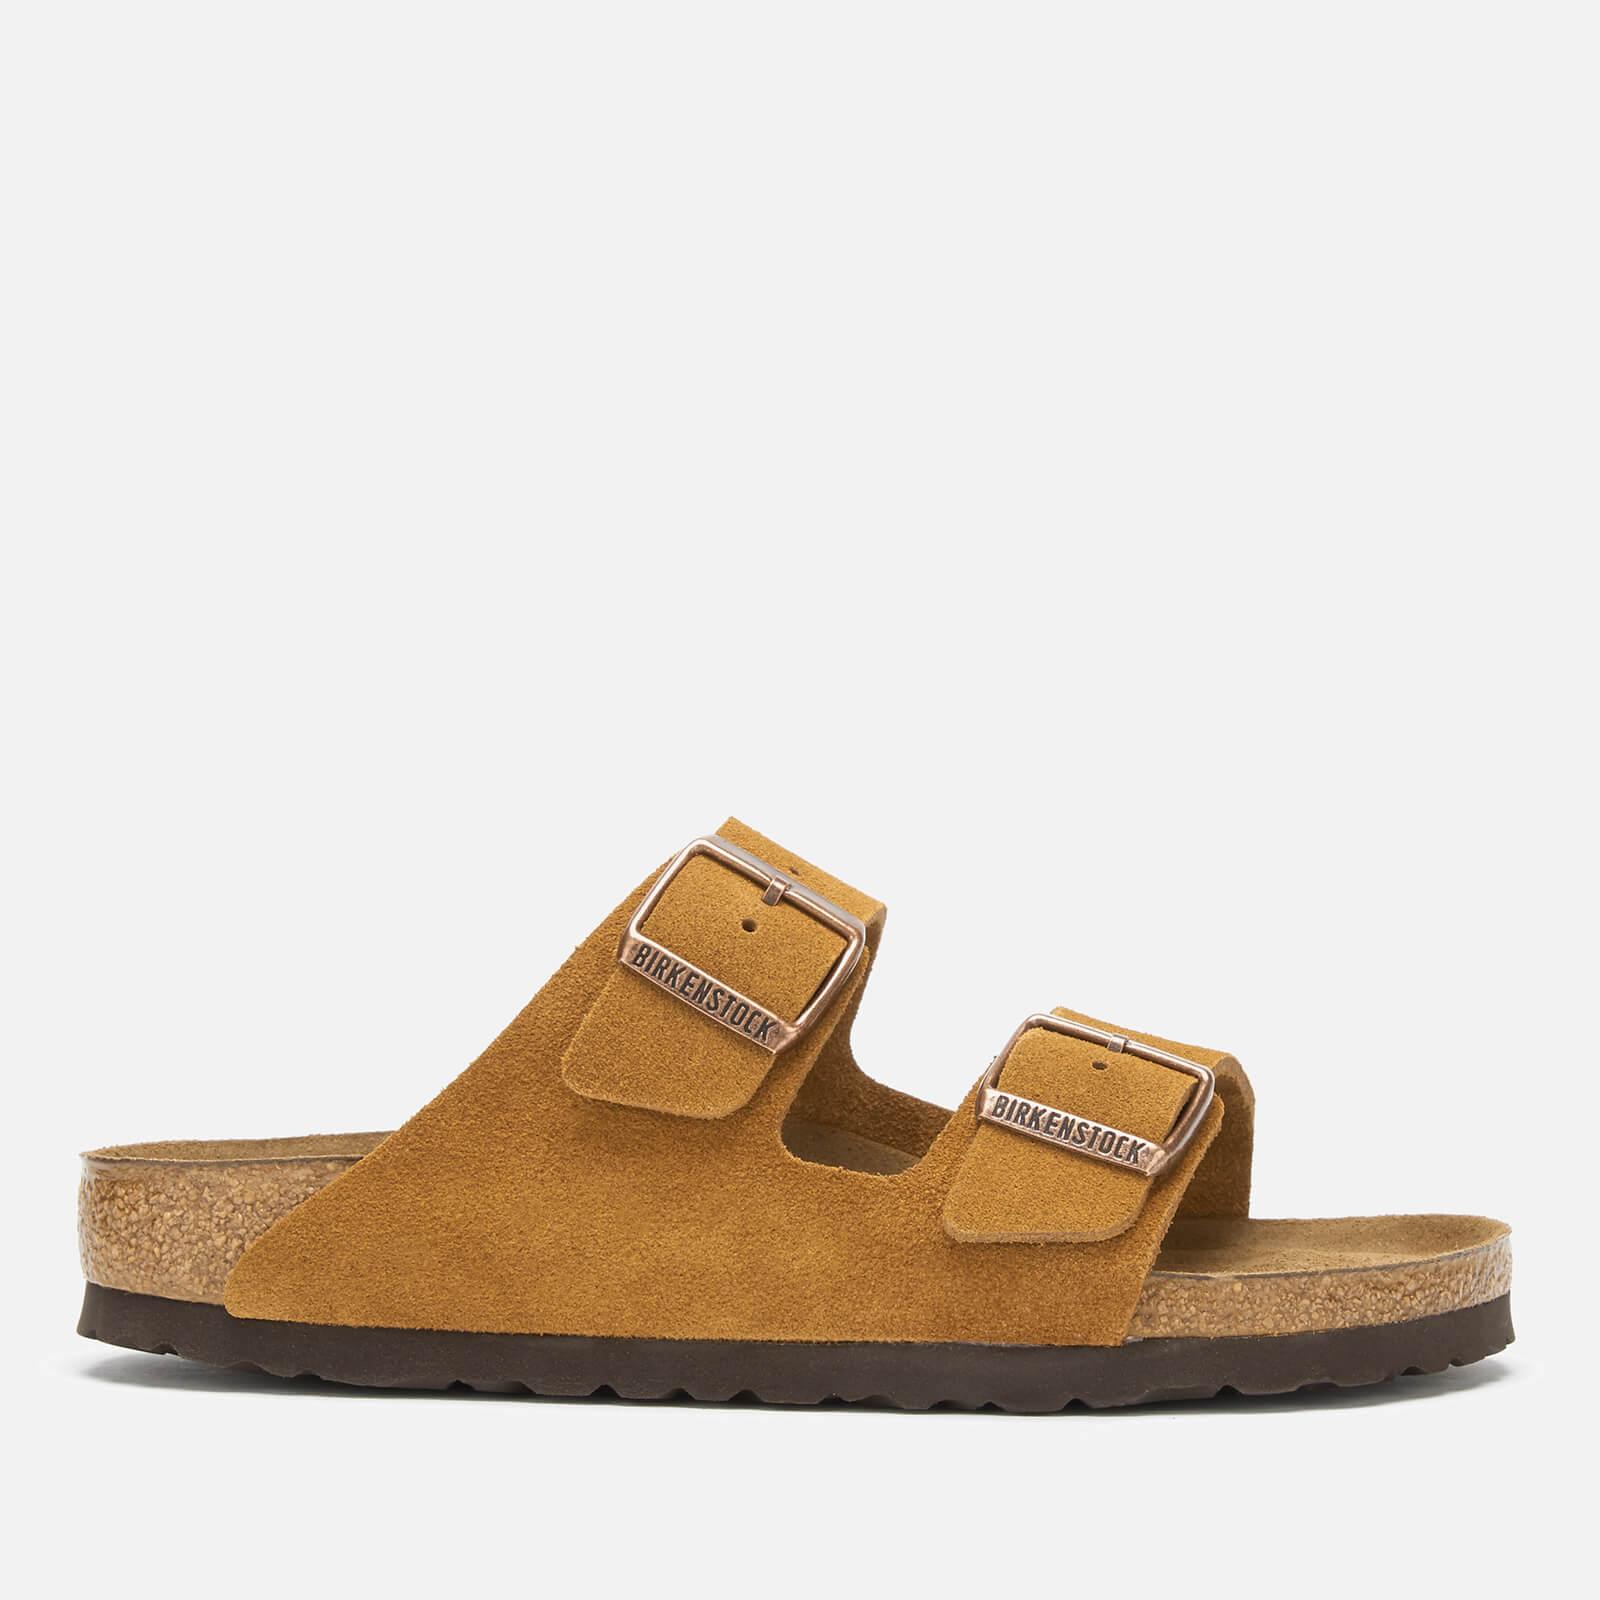 Birkenstock Women's Arizona Sfb Suede Double Strap Sandals - Mink - EU 39/UK 5.5